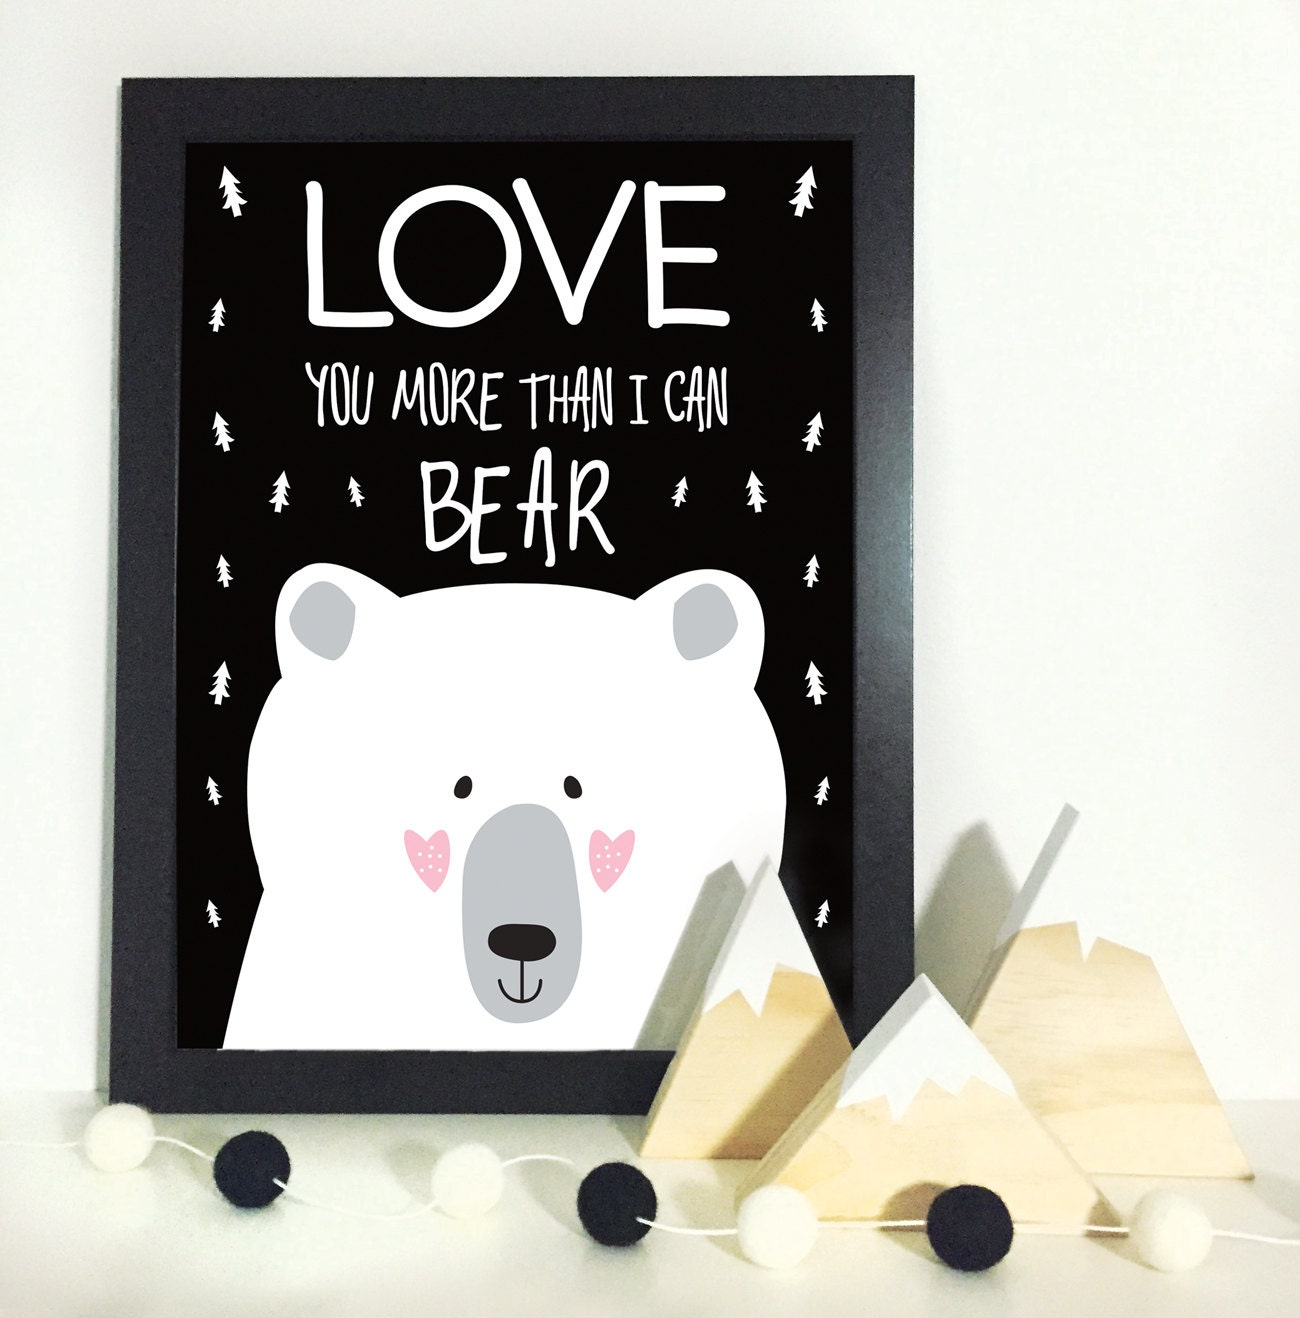 Wall Art Love You More : Love you more than i can bear wall art print decor baby